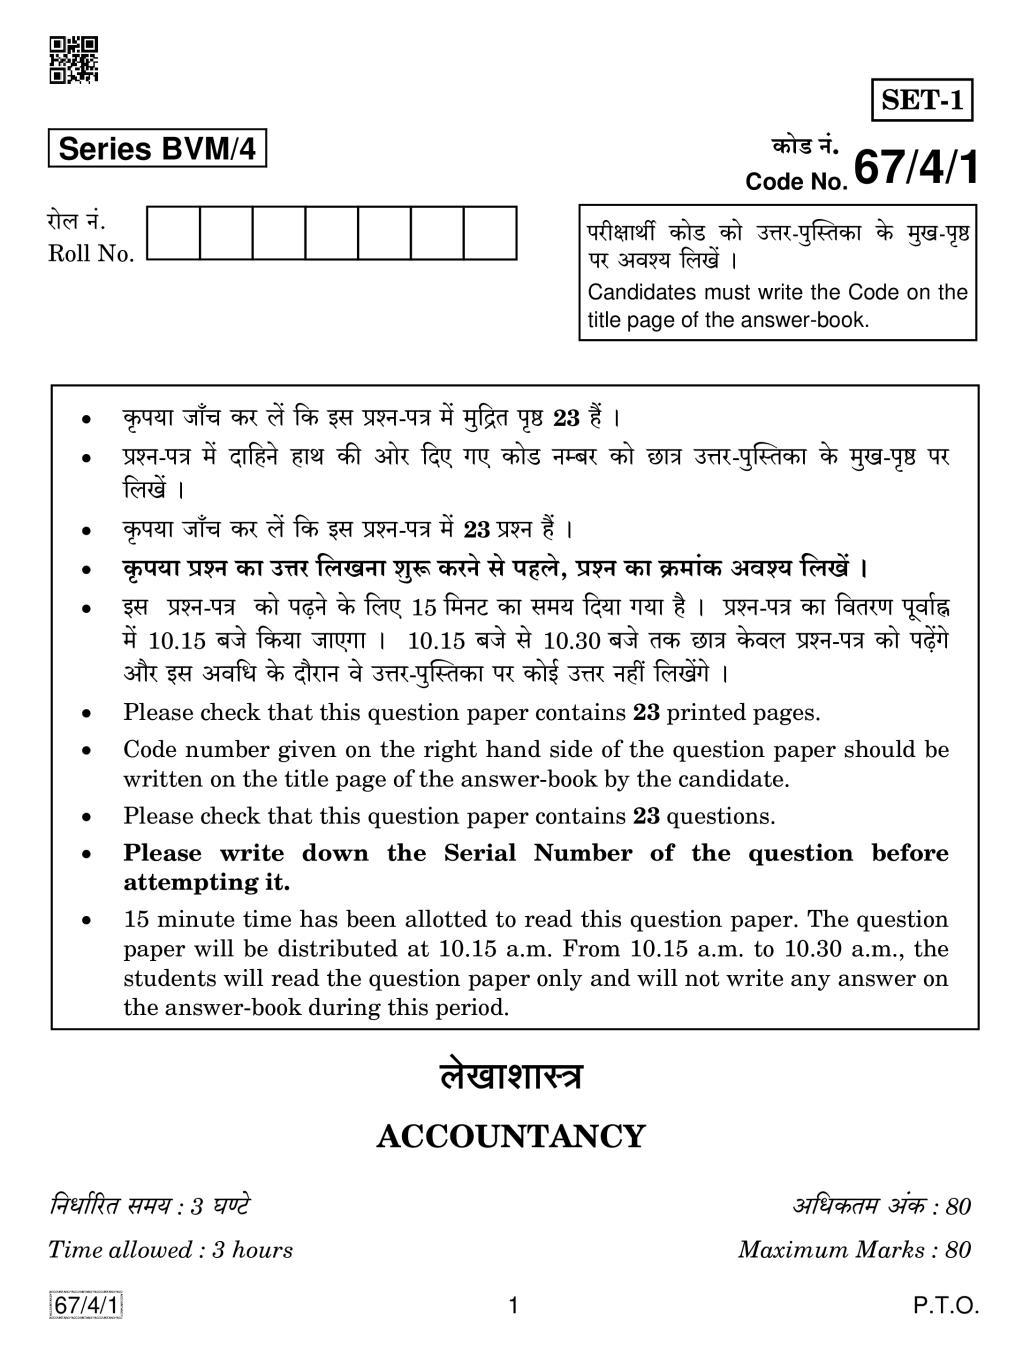 CBSE Class 12 Accountancy Question Paper 2019 Set 4 - Page 1